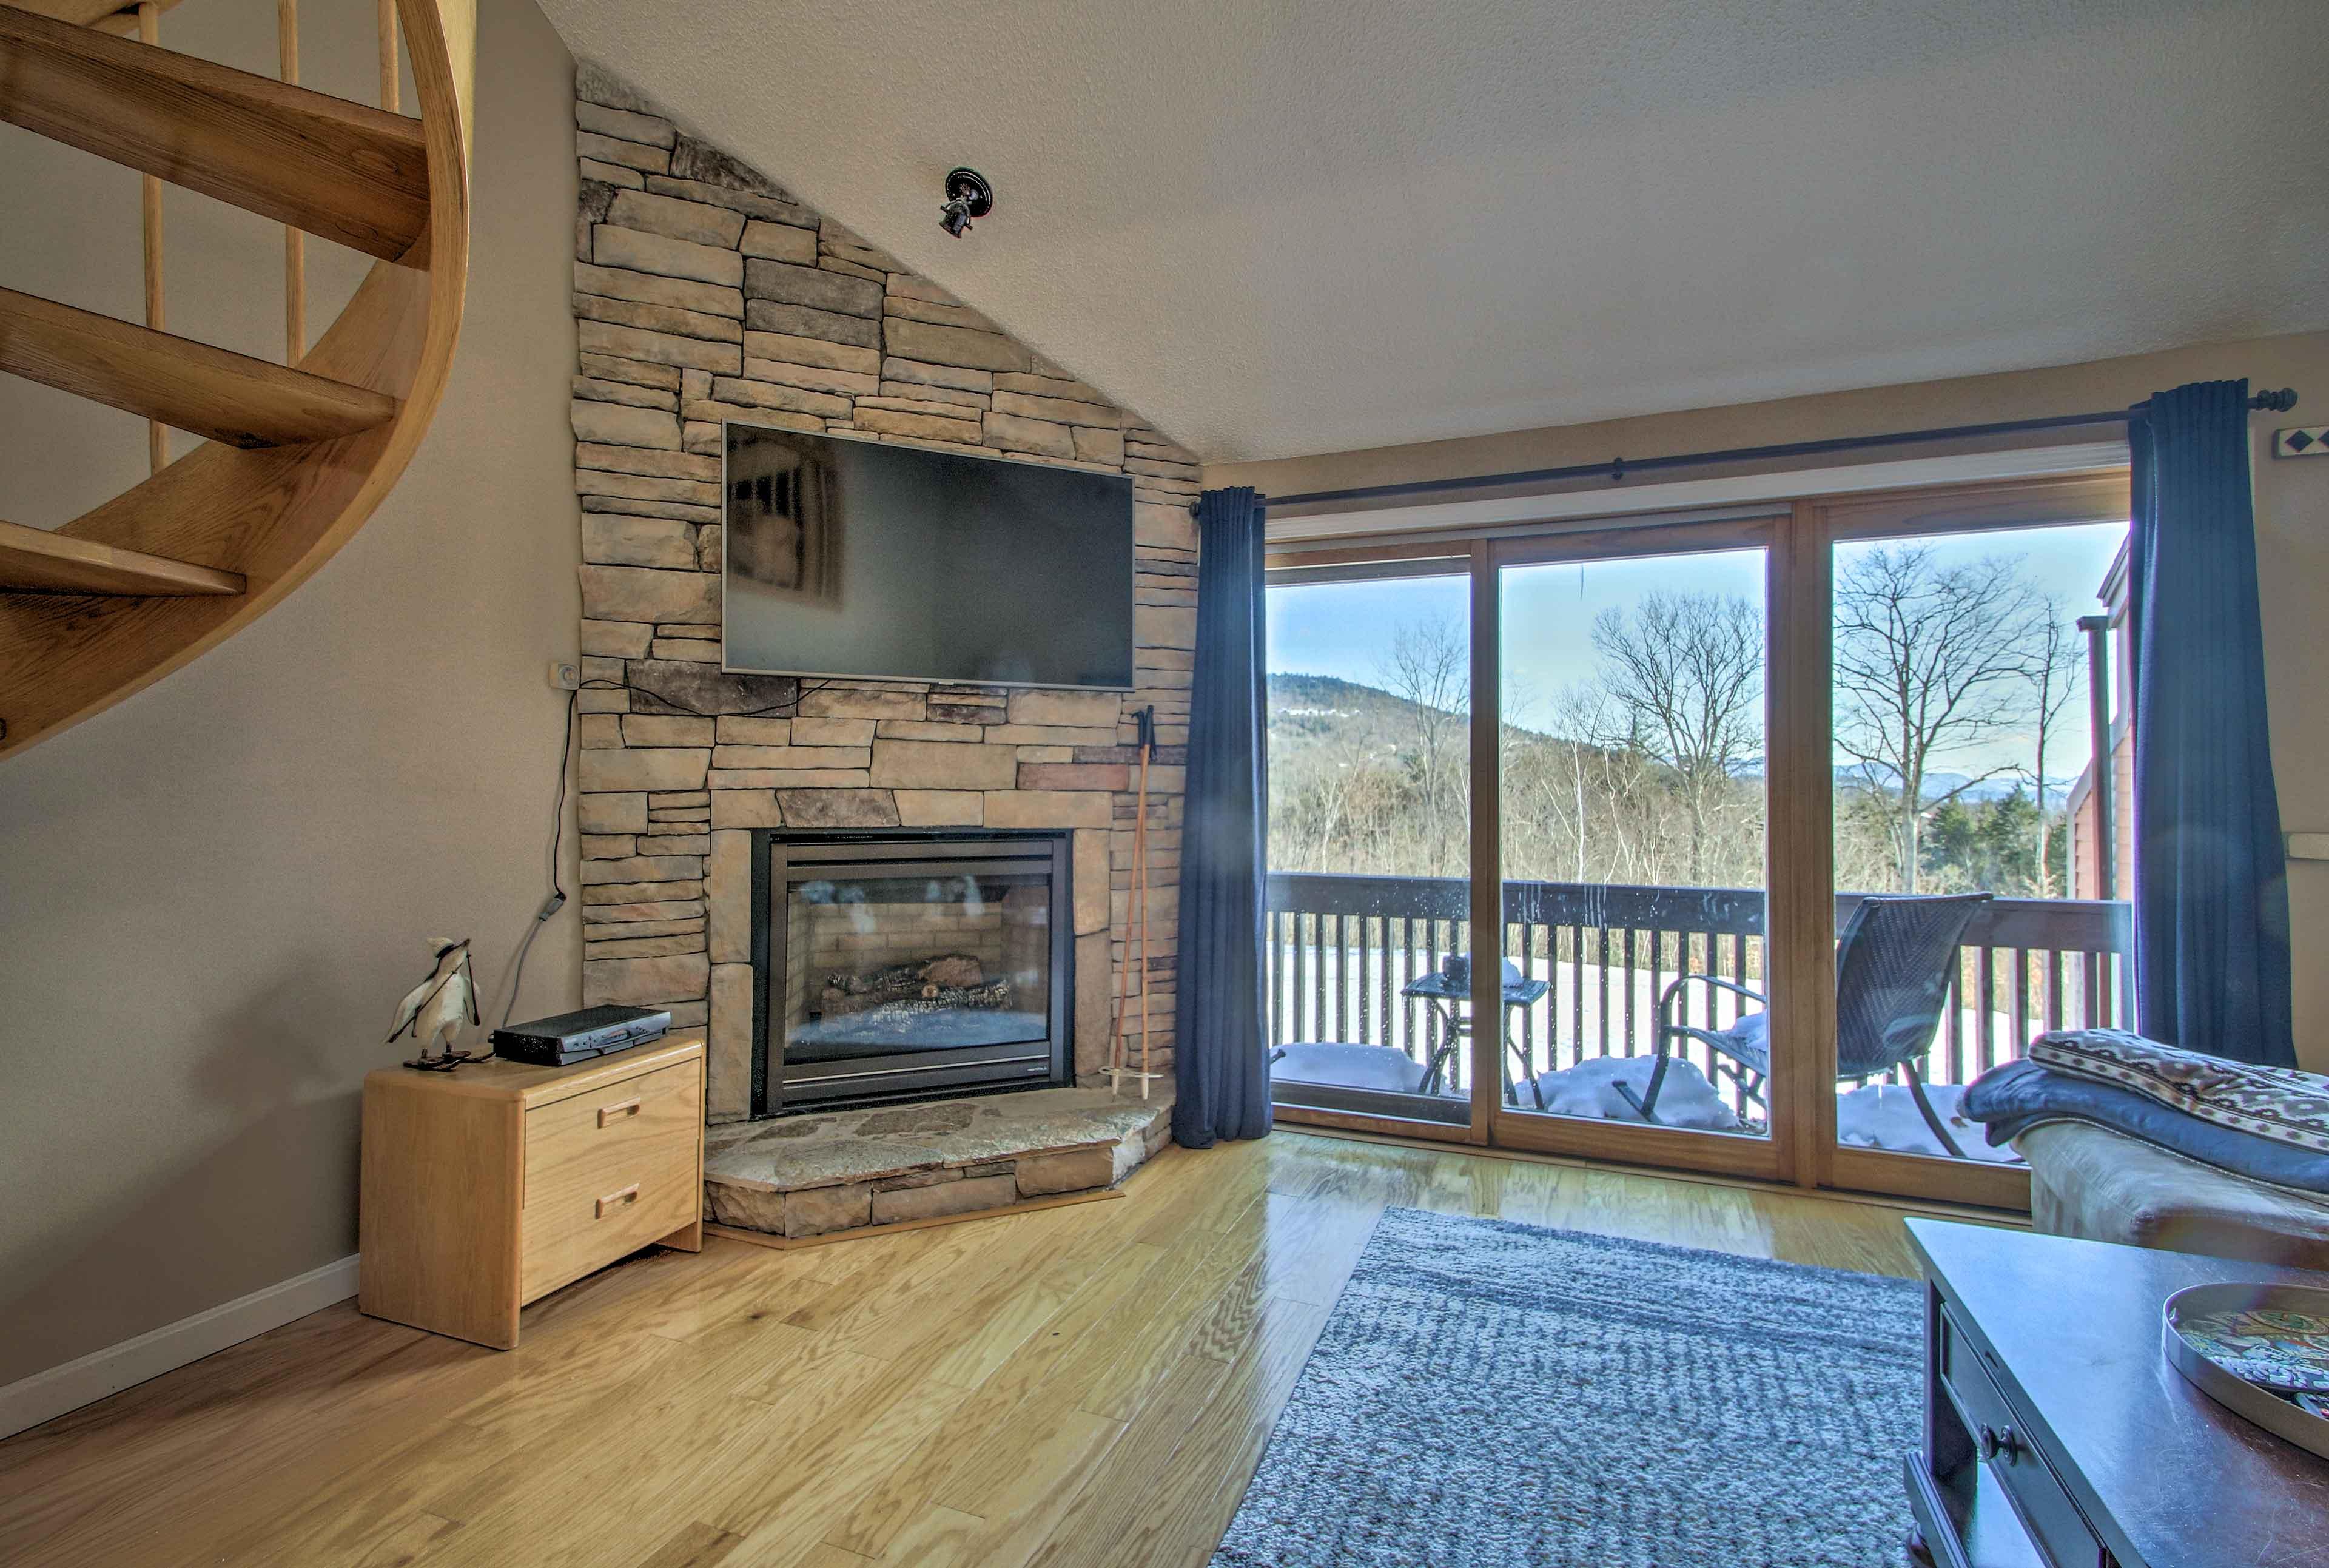 Unwind beside hardwood floors, a charming stone fireplace and mountain views.